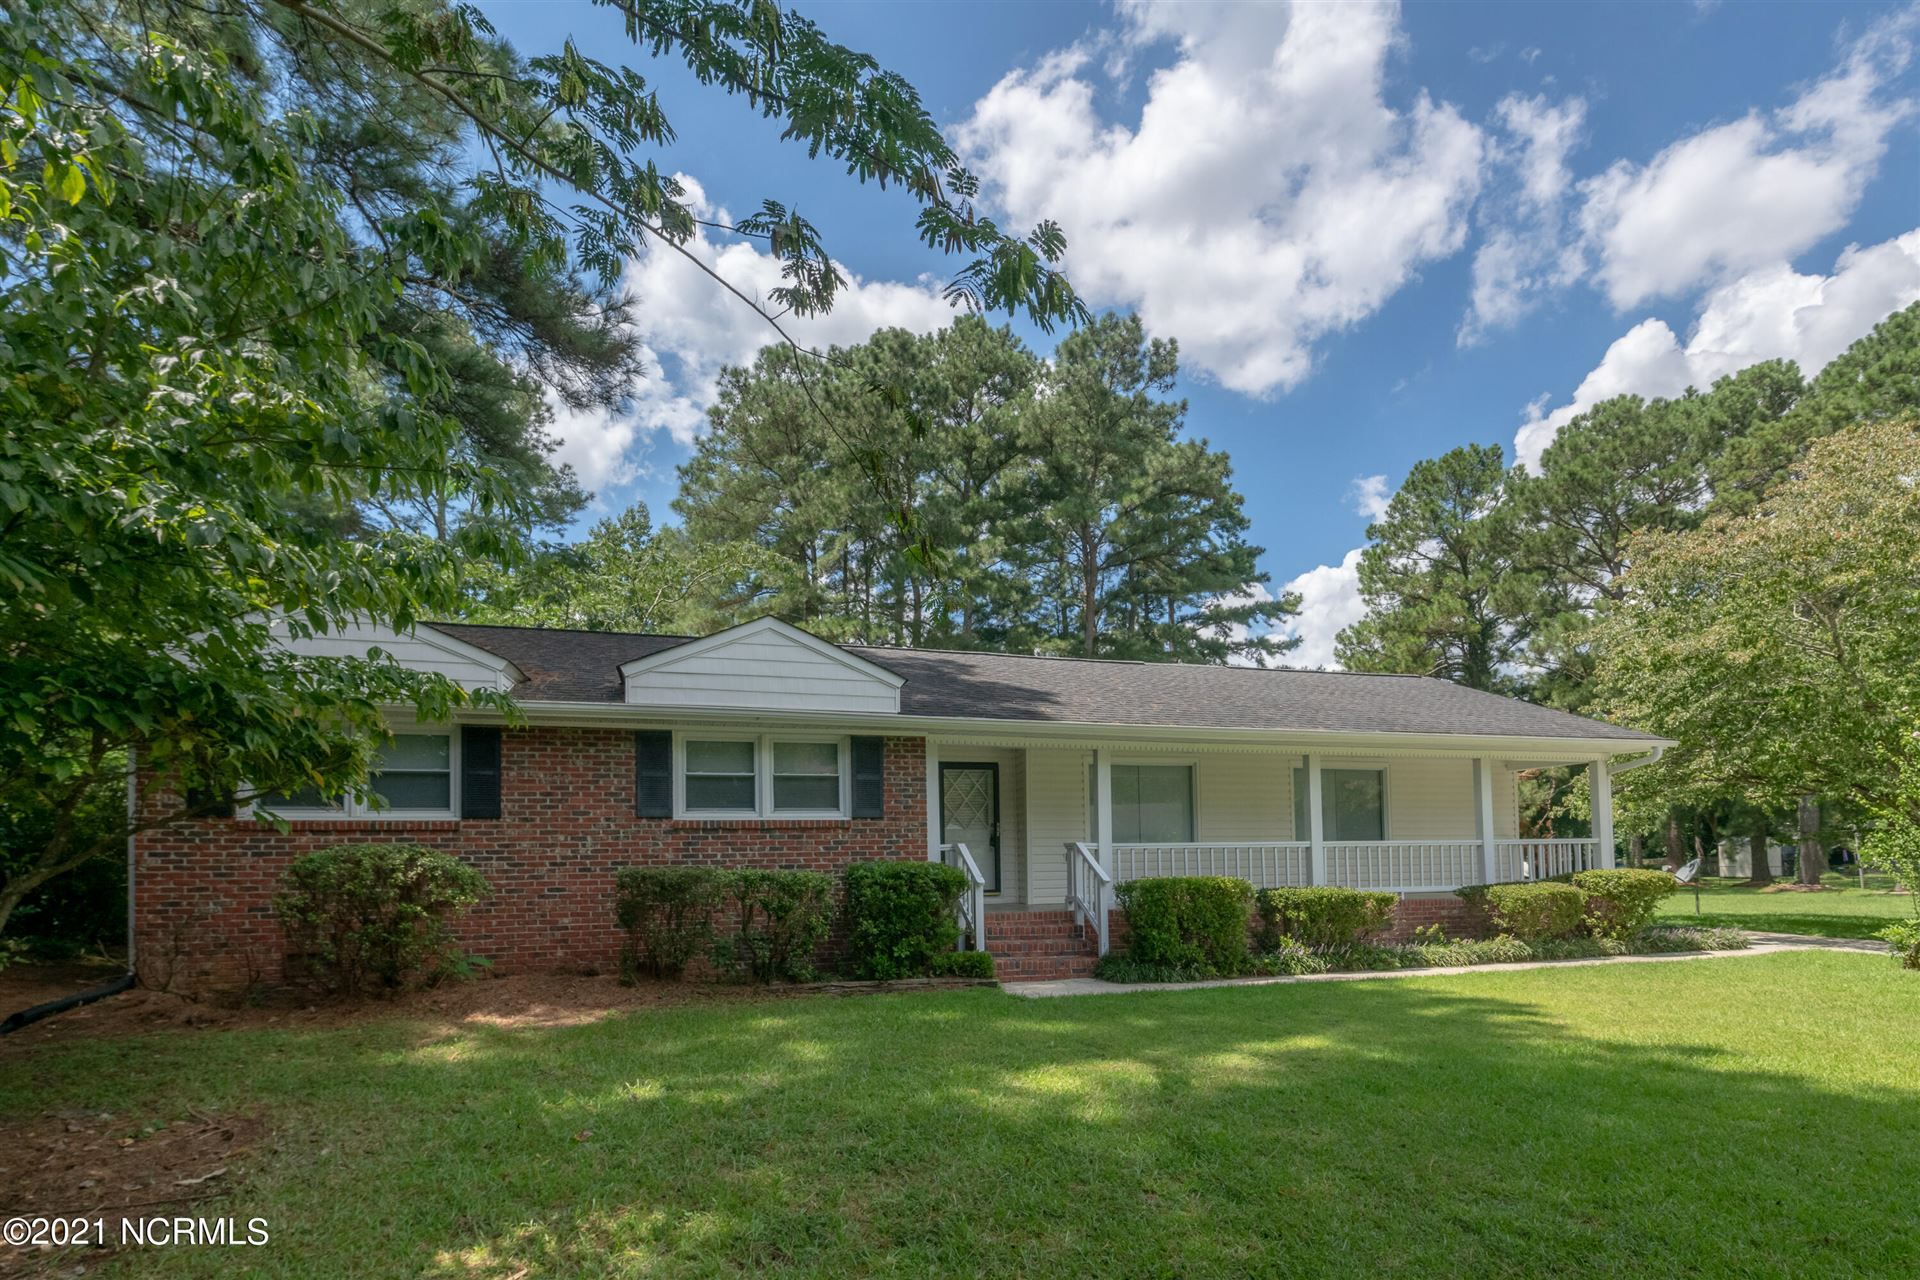 Photo of 105 Avalon Lane, Greenville, NC 27858 (MLS # 100287291)